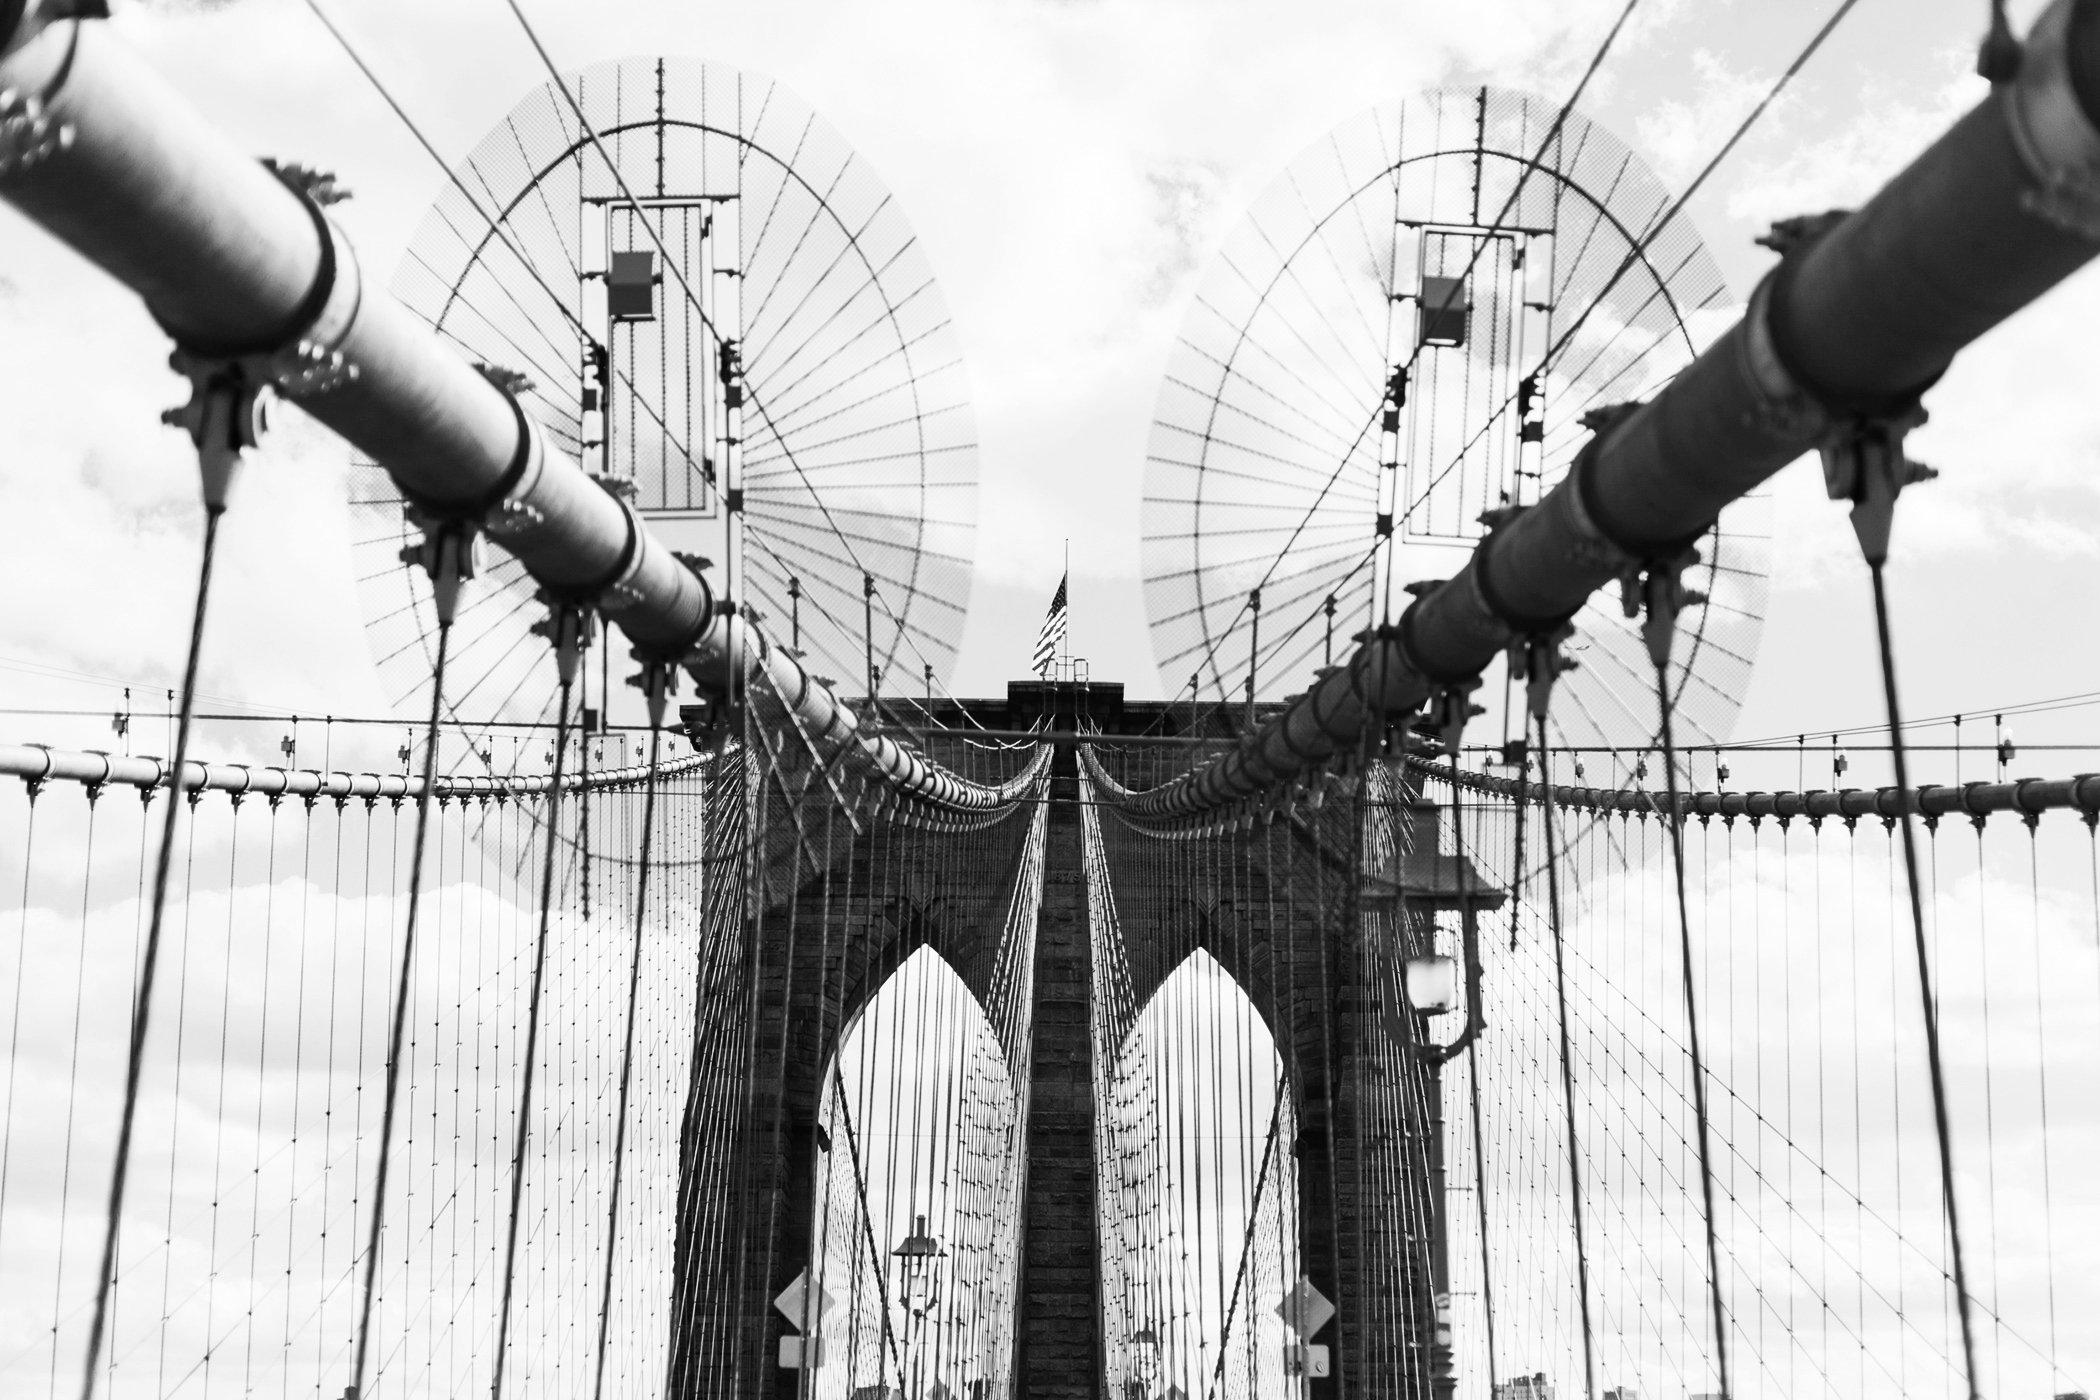 New-york-part-ONE-25